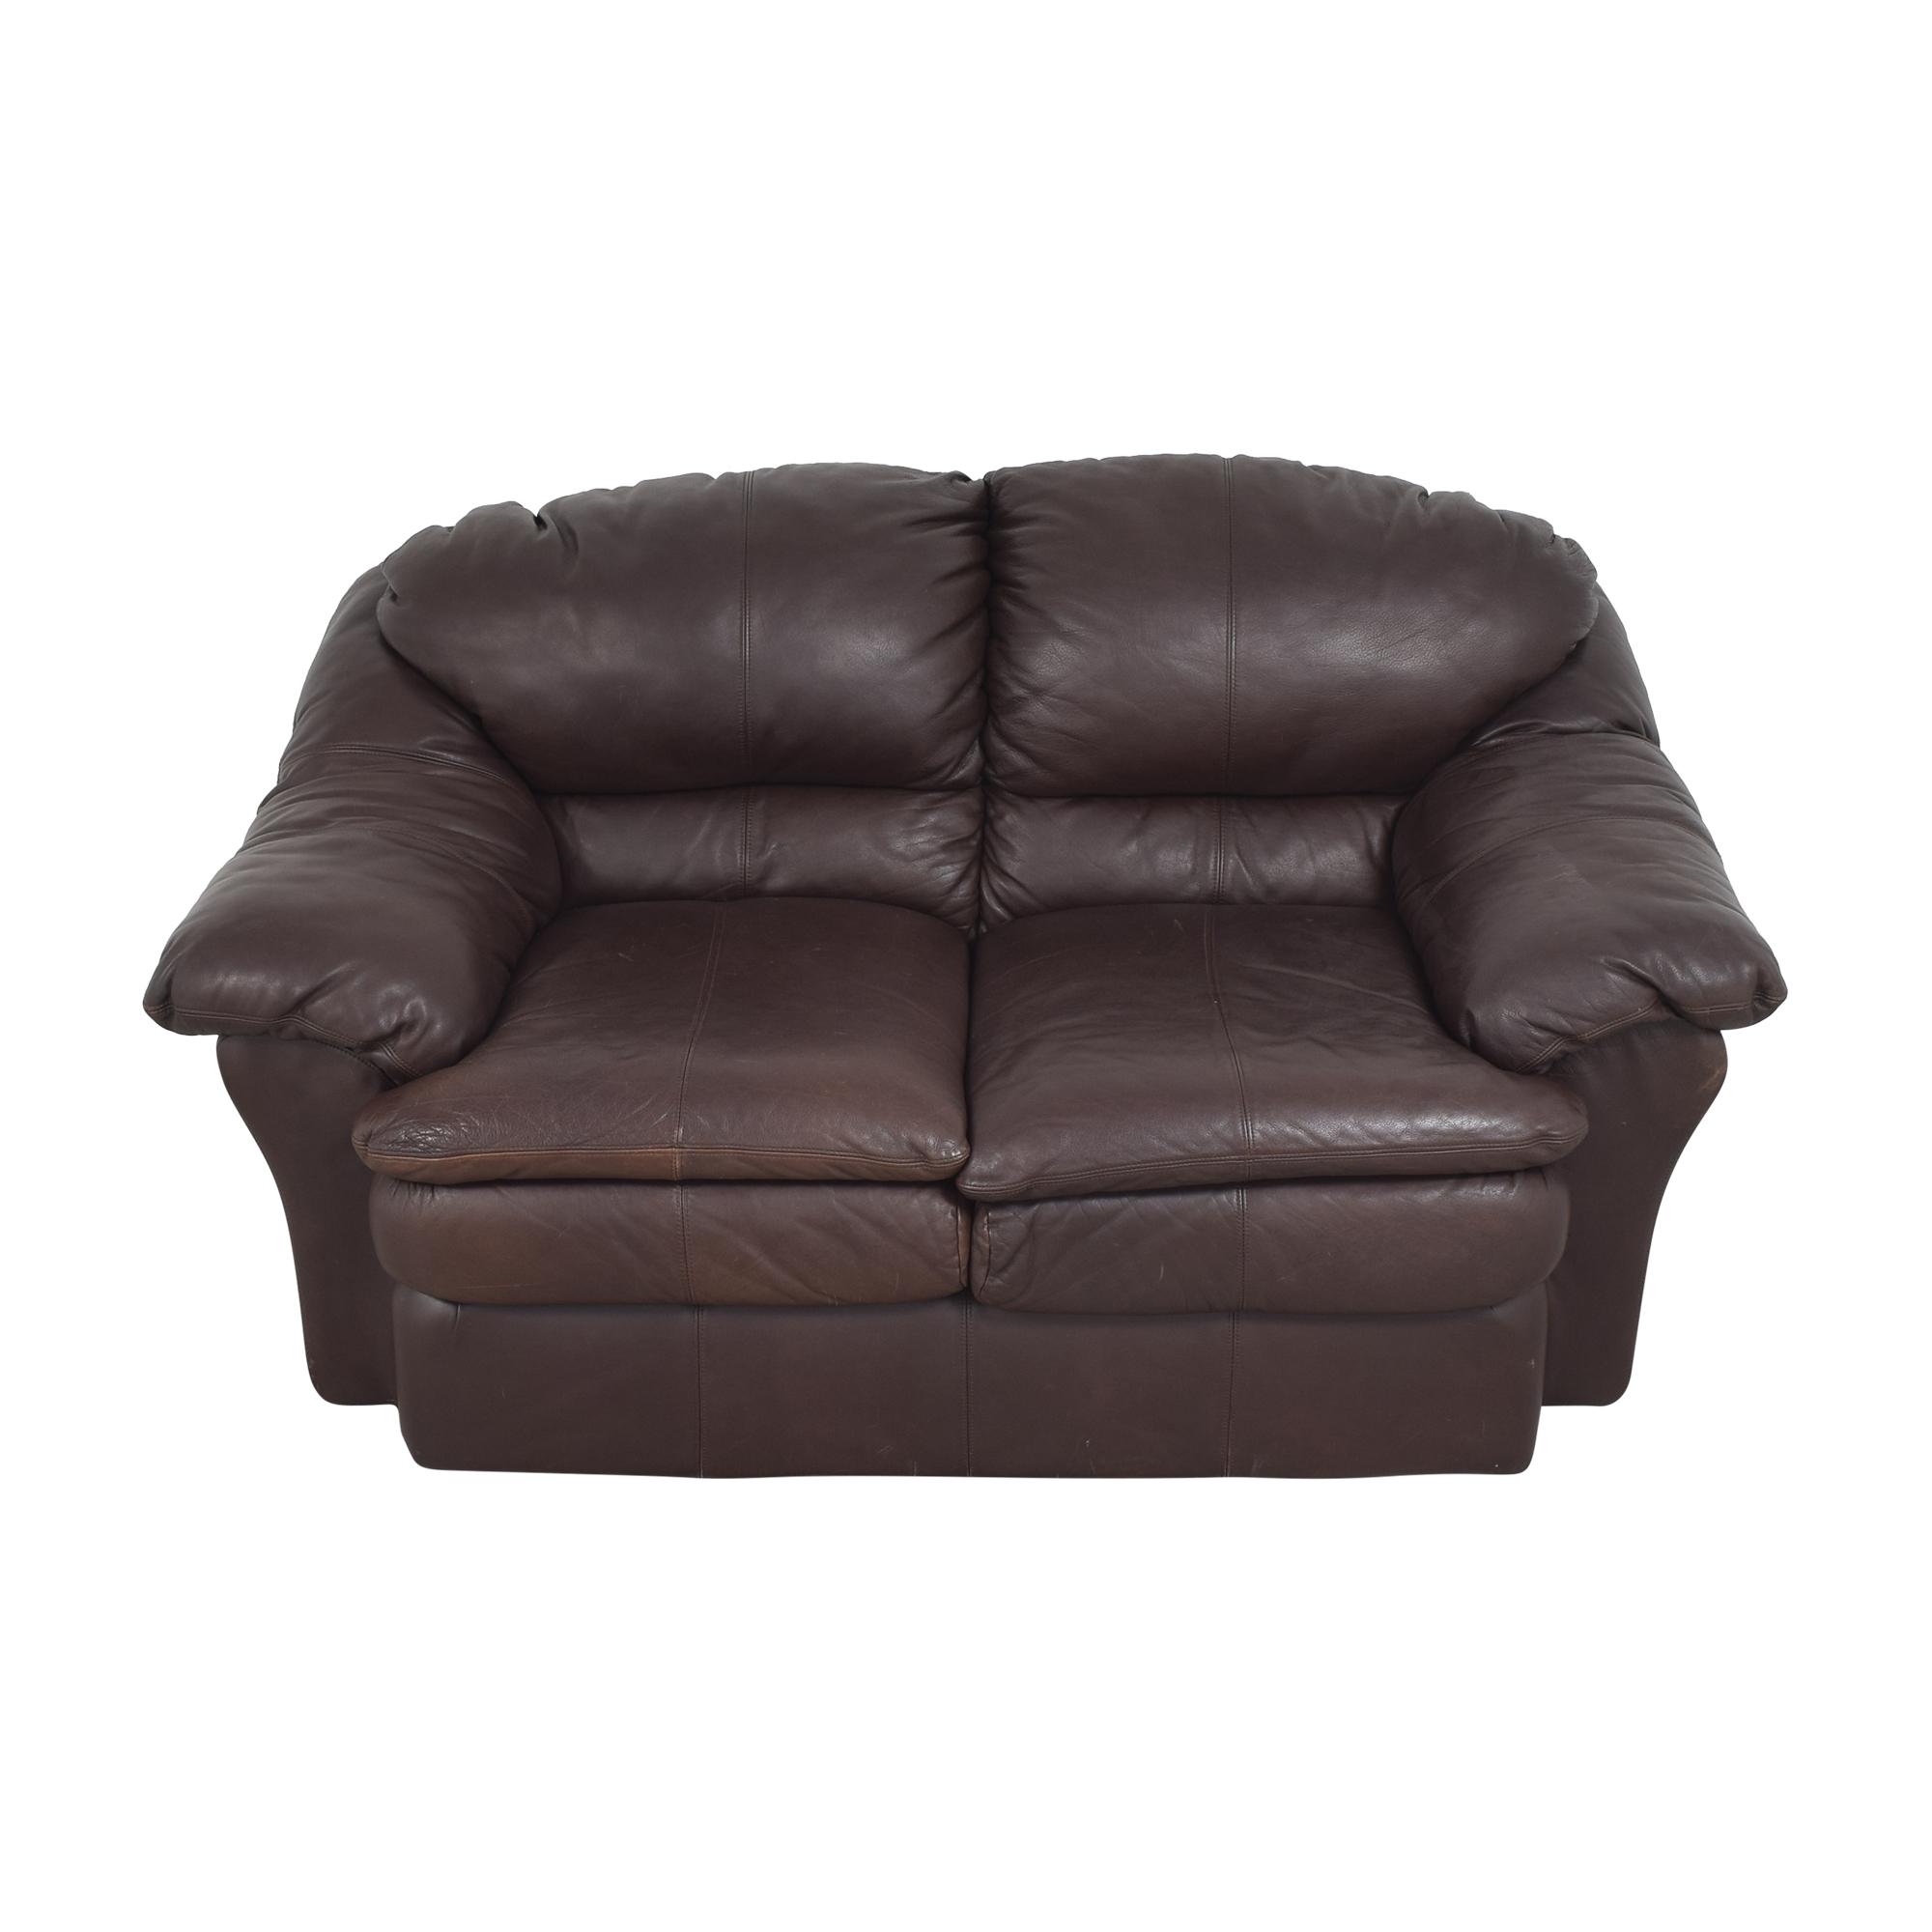 Ashley Furniture Ashley Furniture Loveseat price